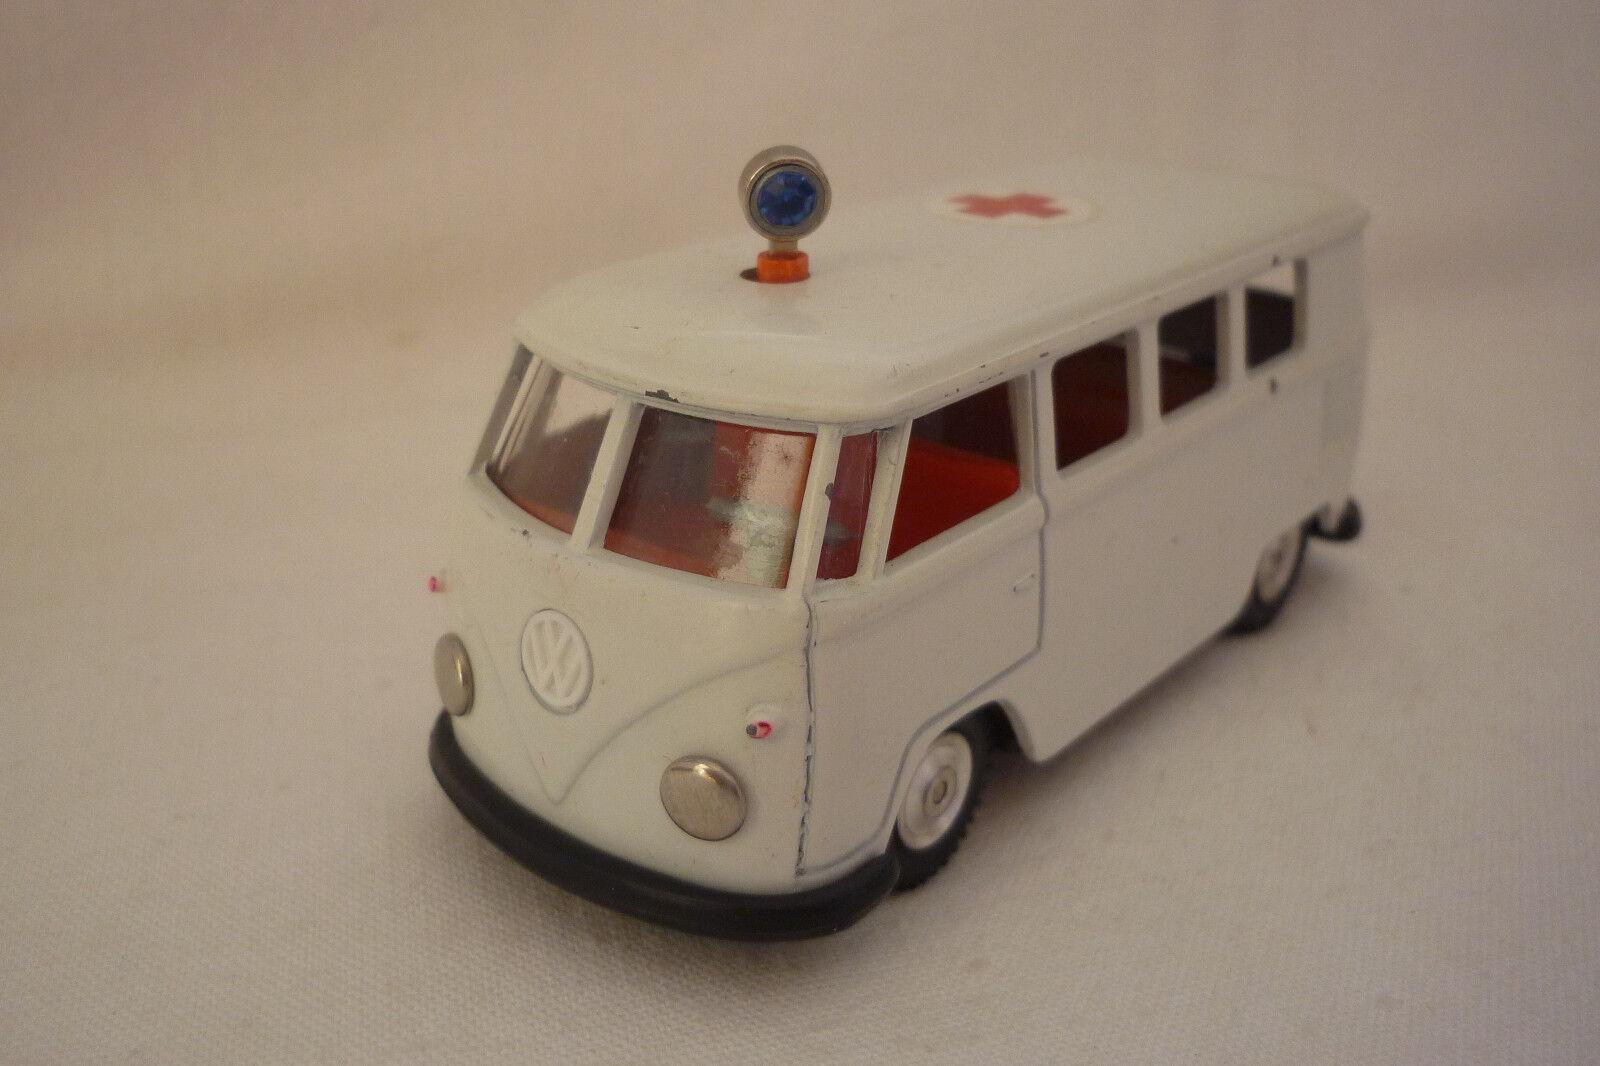 Gama - Mini-Modell - VW Bus - T 1 Bulli Red cross - No. 955 1 43 - (4.DIV-12)